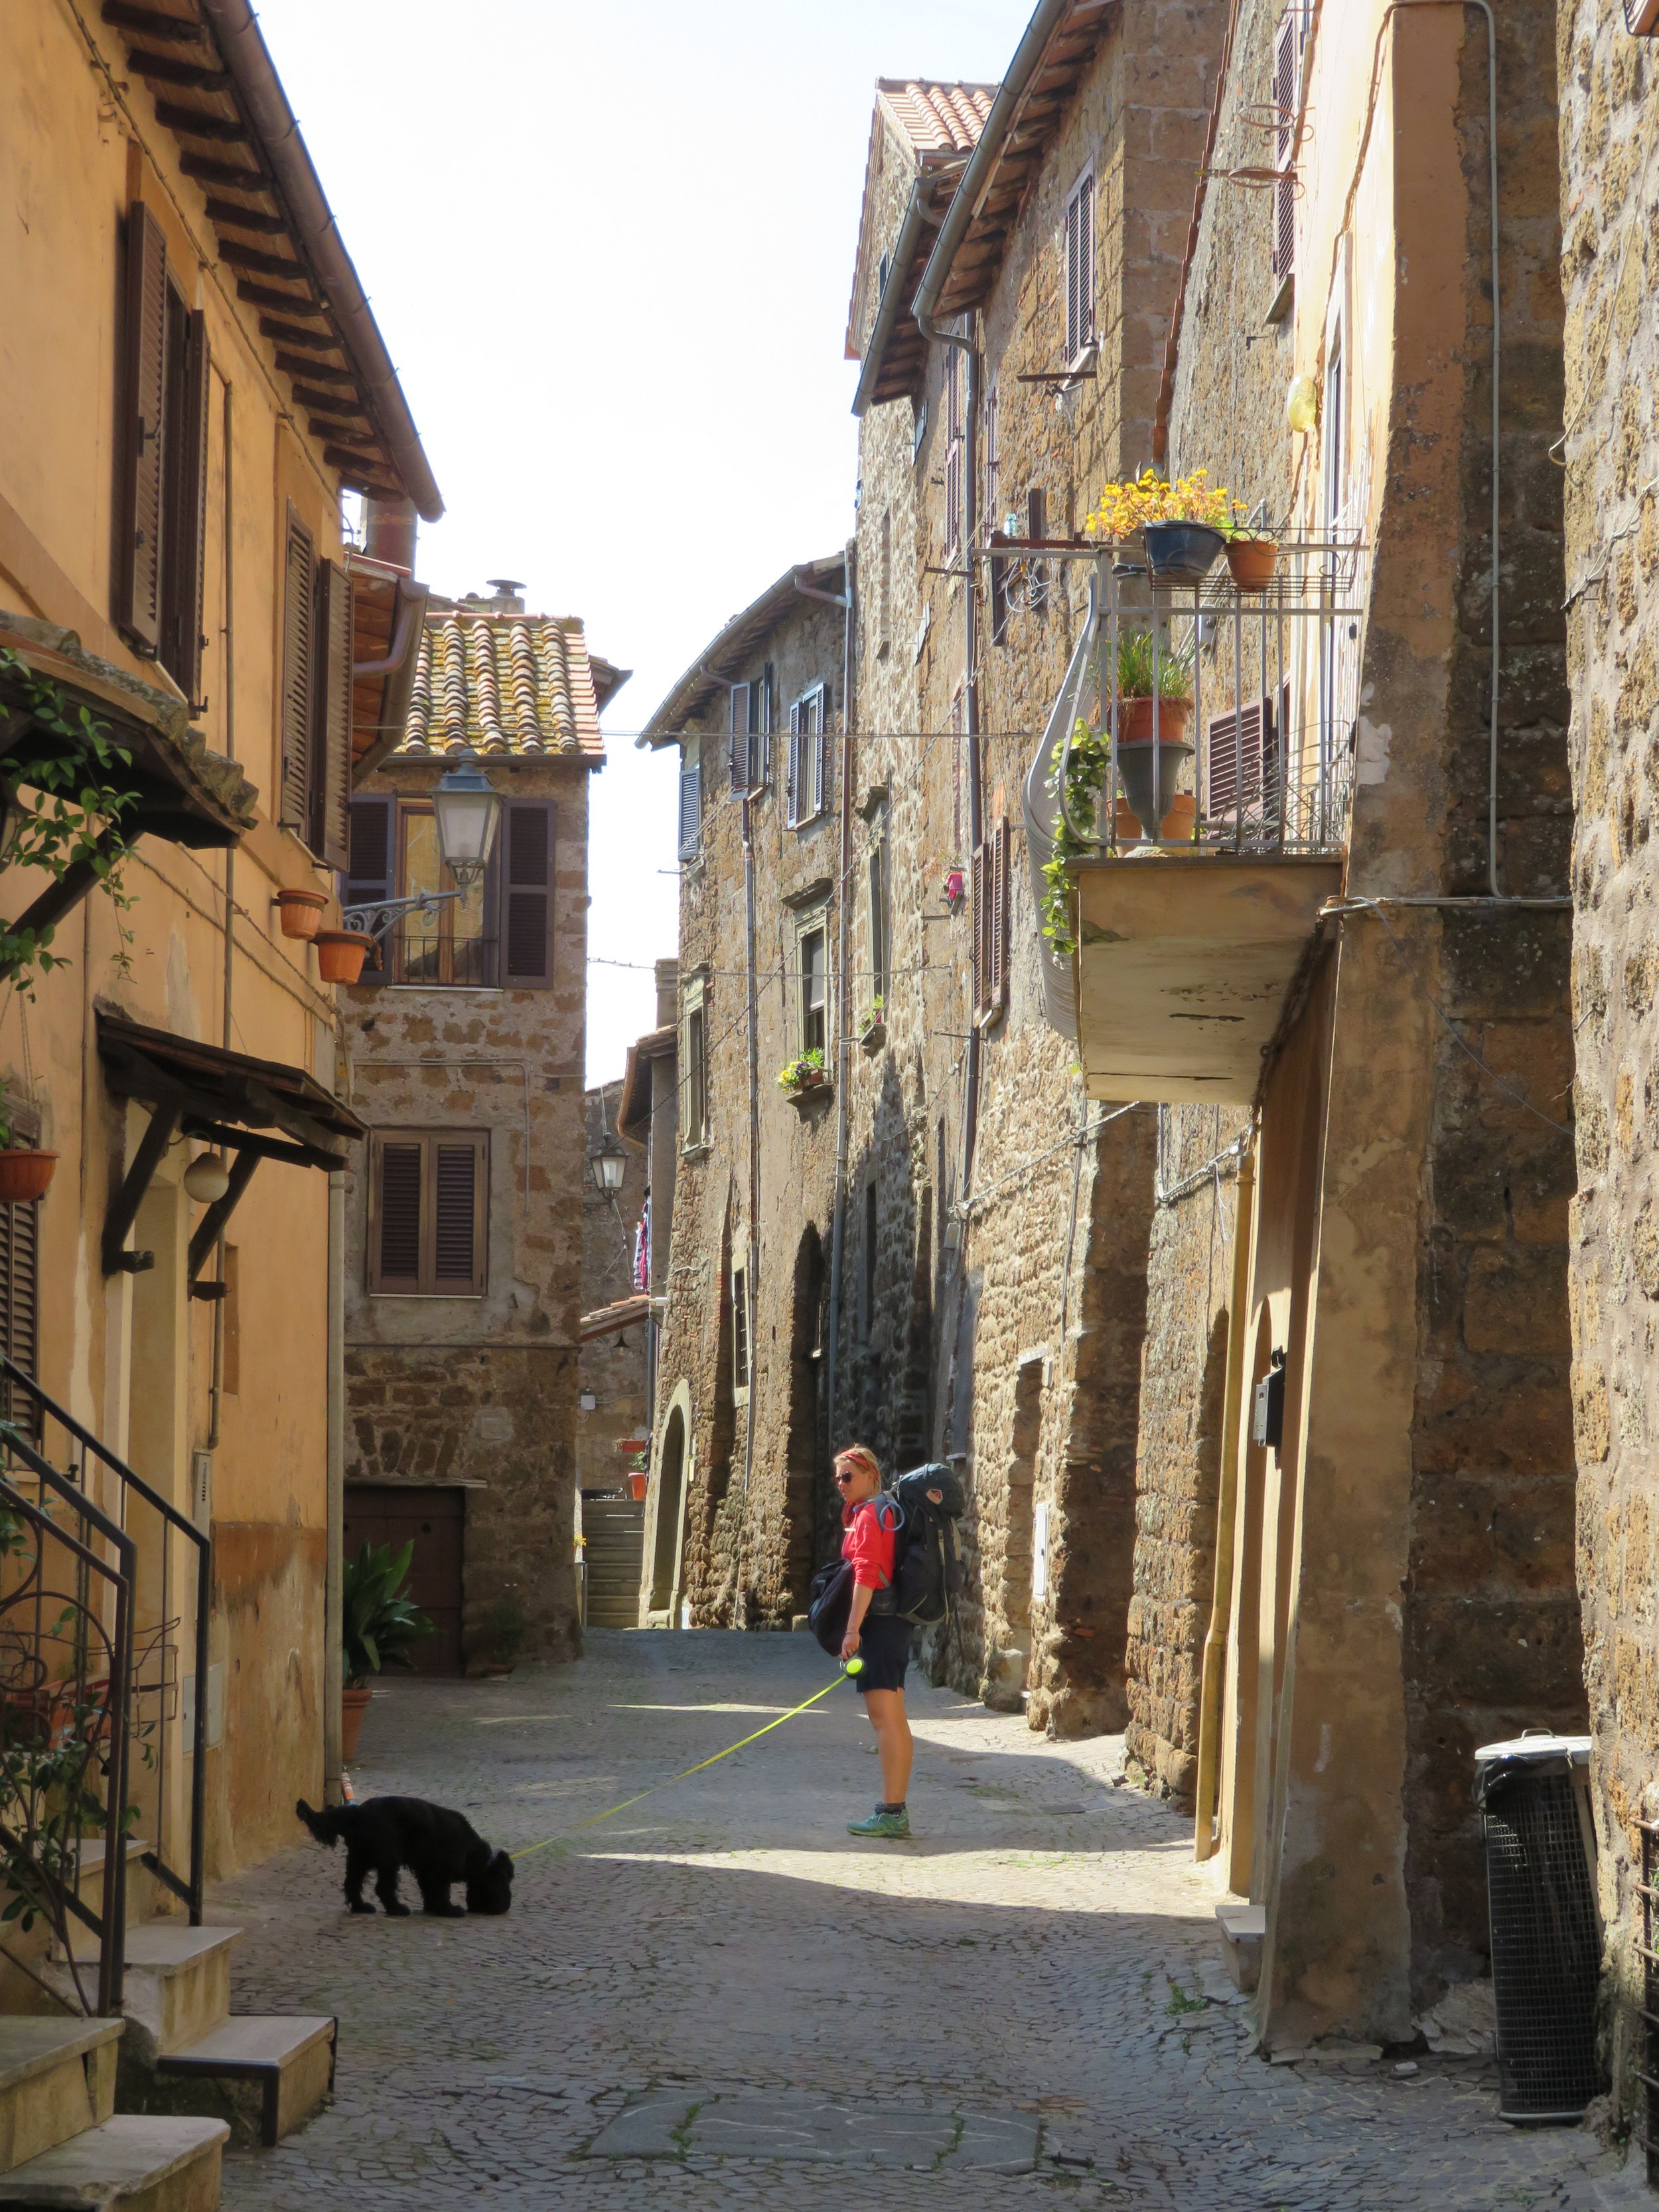 A quaint cobblestone street in Italy